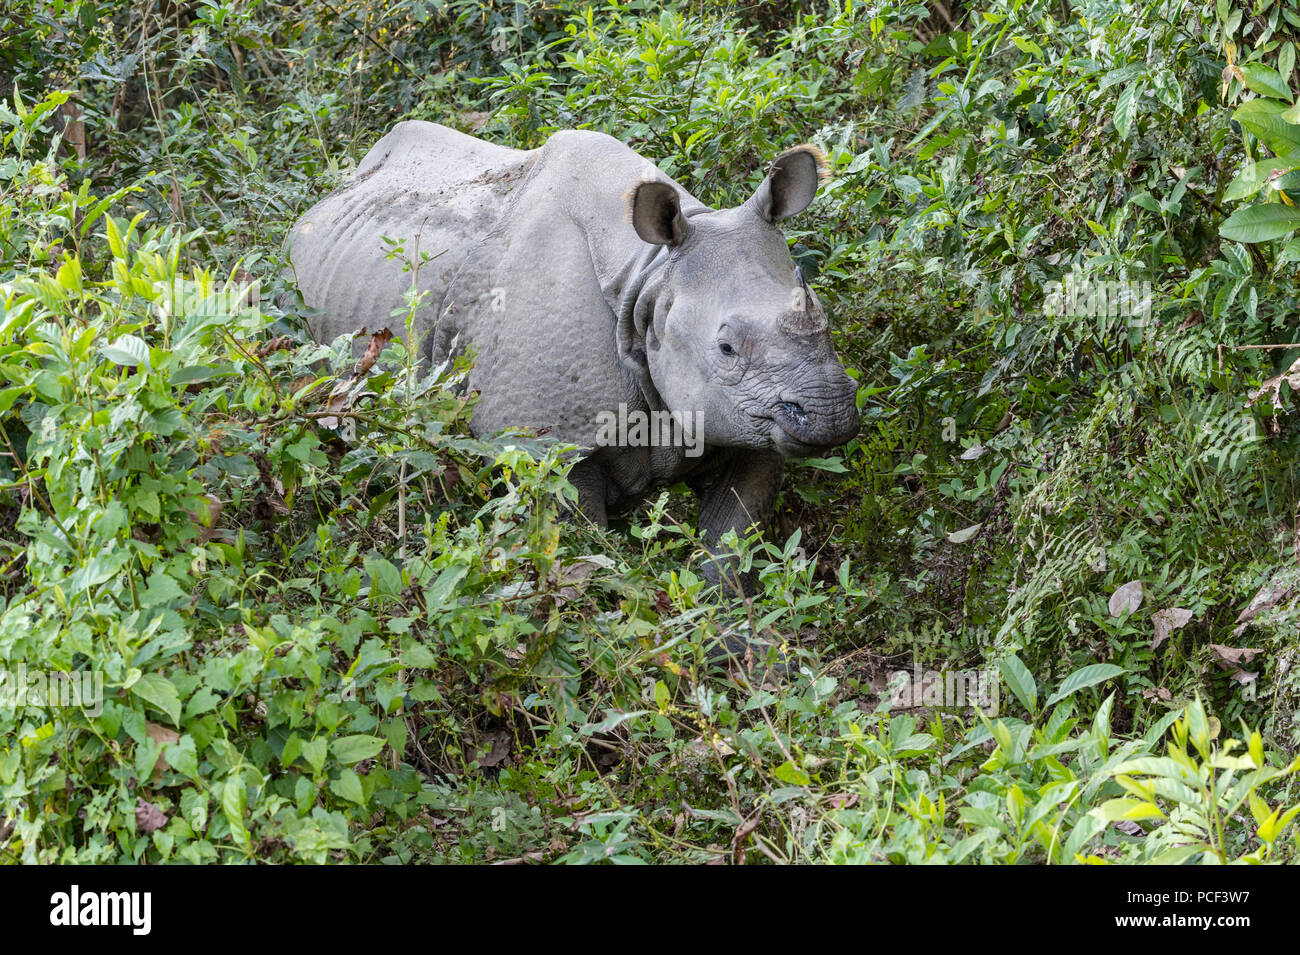 Indian rhinoceros (Rhinoceros unicornis) in the forest, Chitwan National Park, Nepal - Stock Image